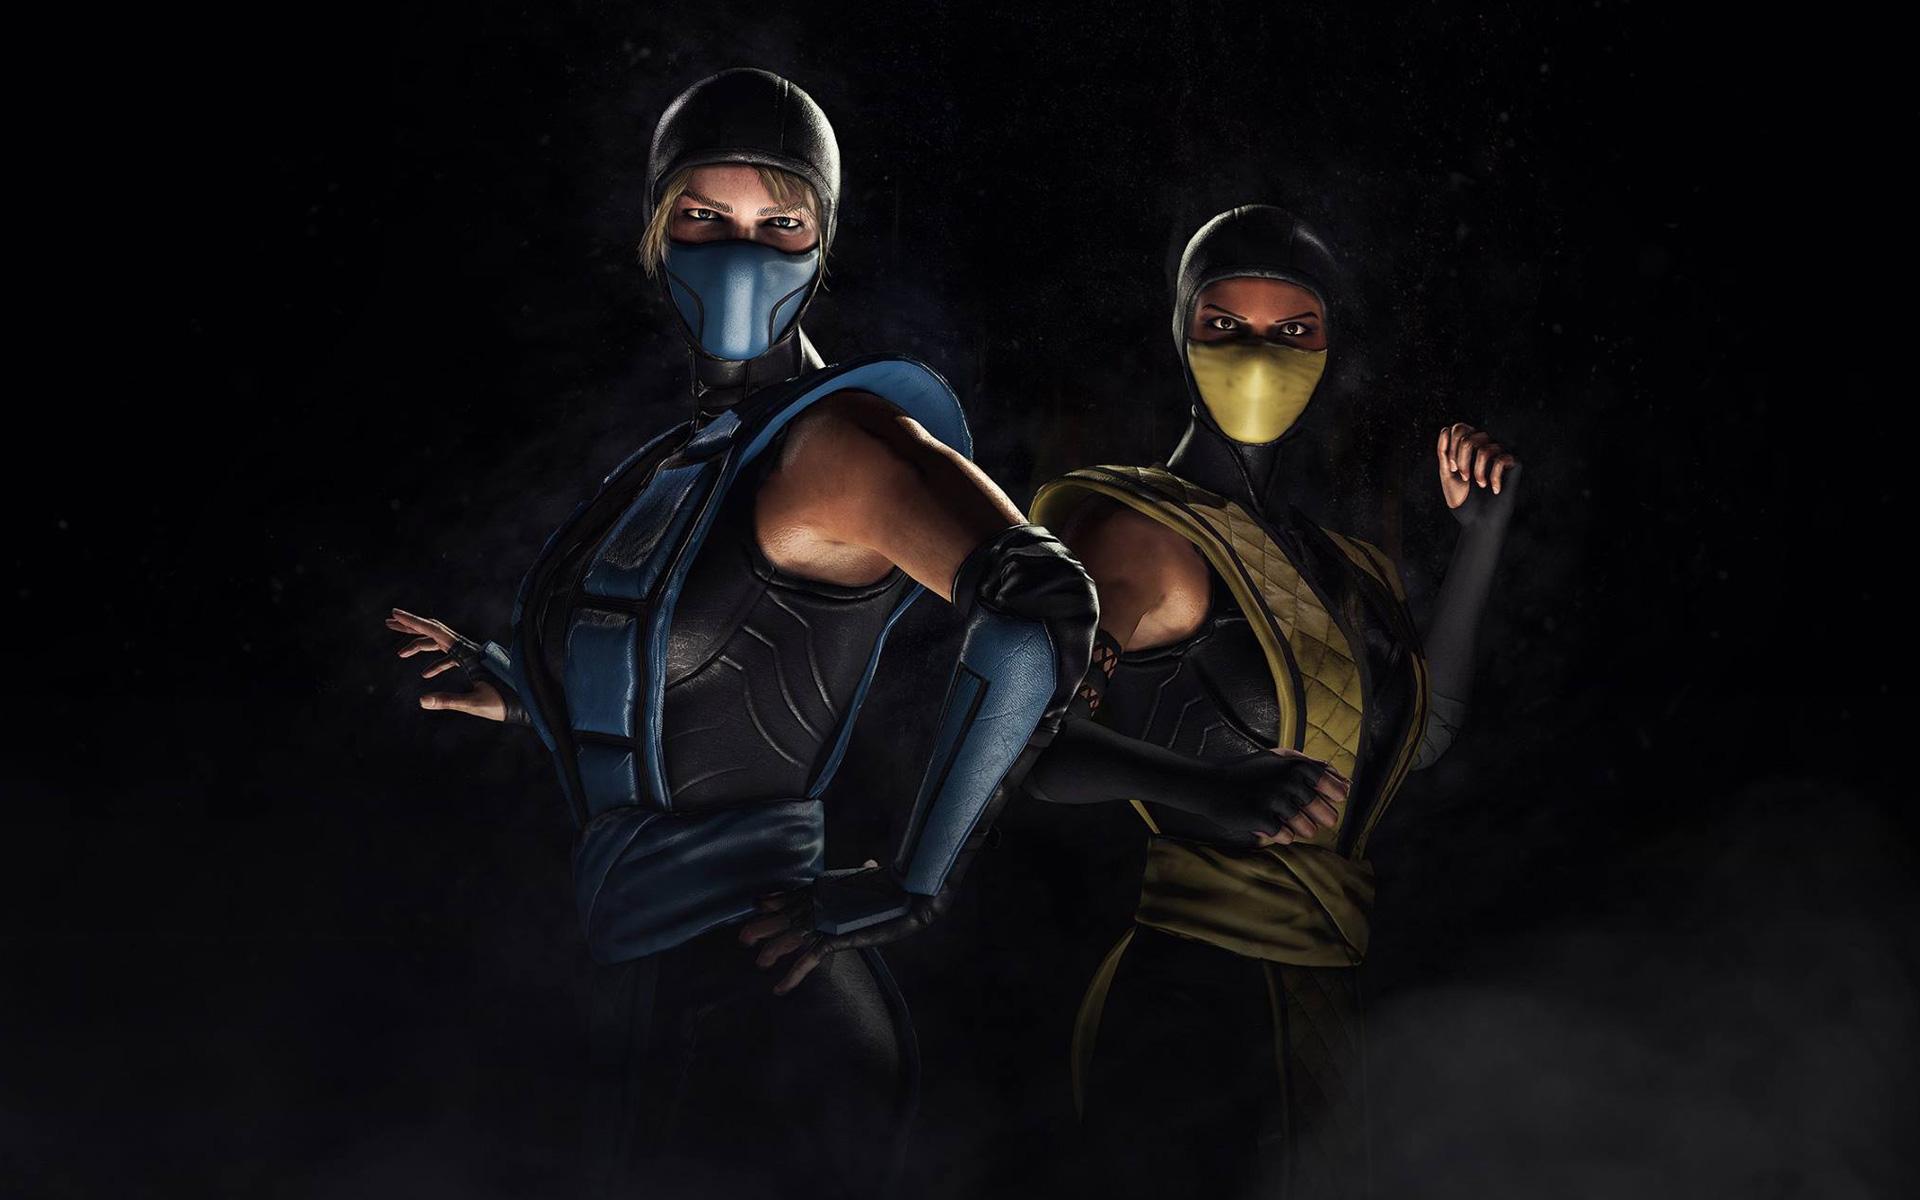 Mortal Kombat XL Sub Zero Scorpion Kosplay Wallpapers HD Wallpapers 1920x1200